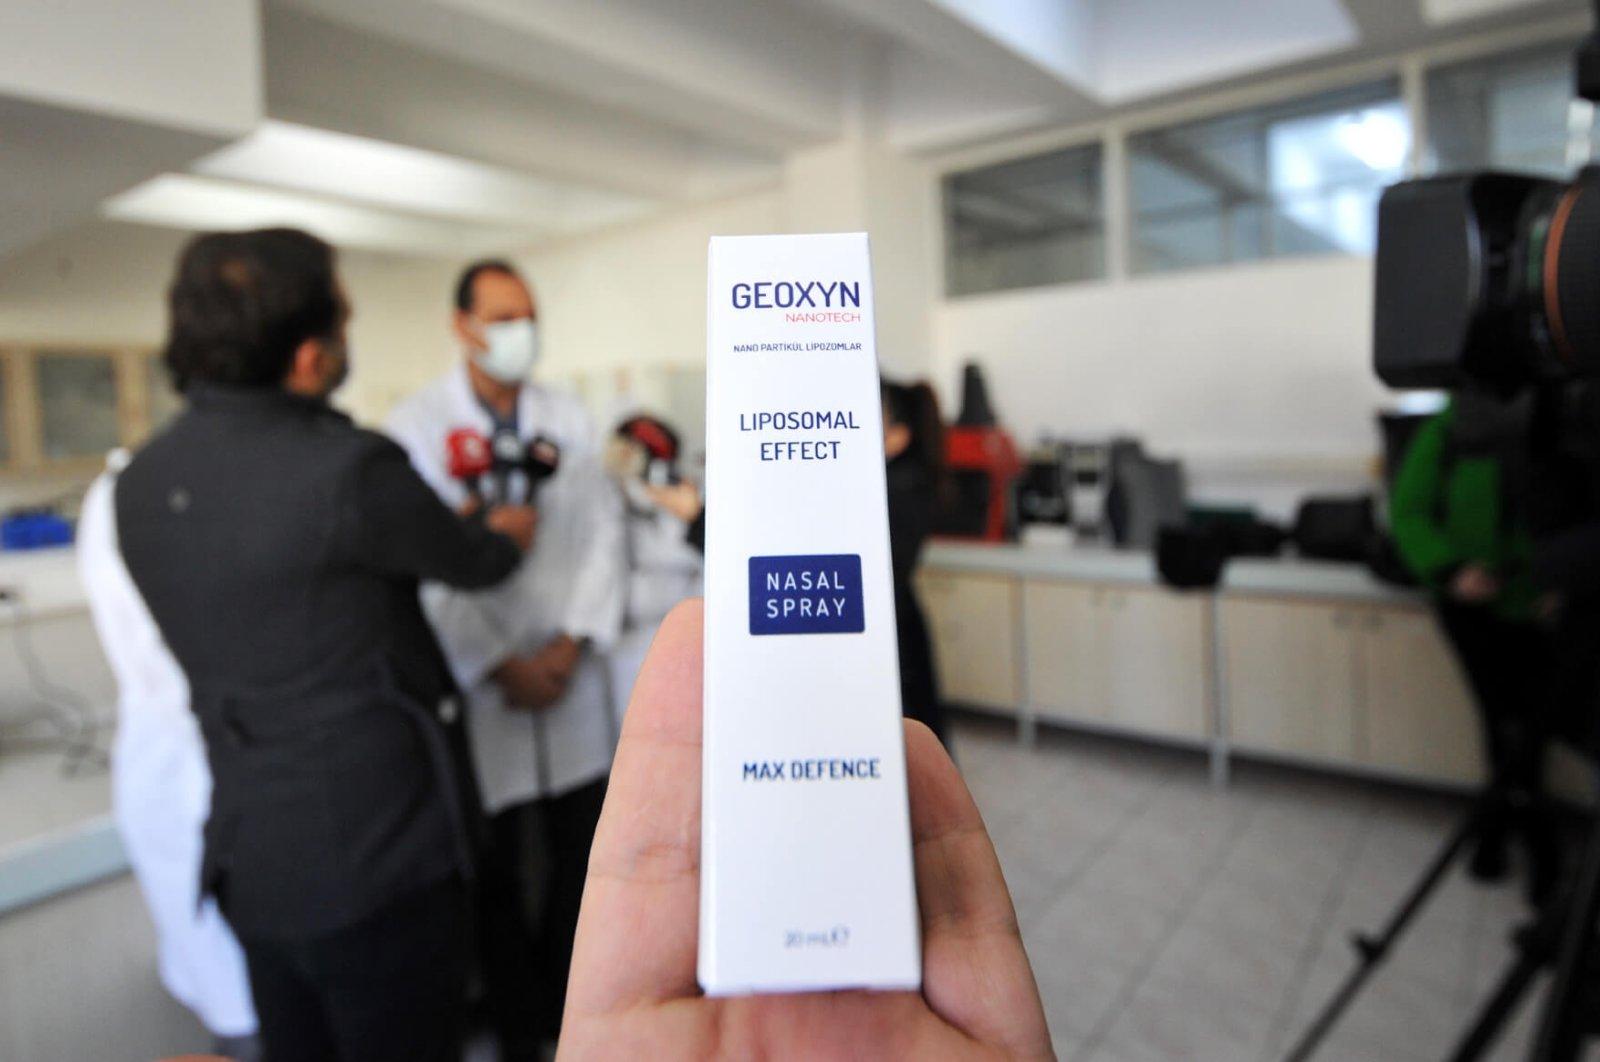 The nasal spray developed by Uludağ University is seen at a lab in Turkey's northwestern Bursa province, on Jan. 22, 2021. (AA Photo)